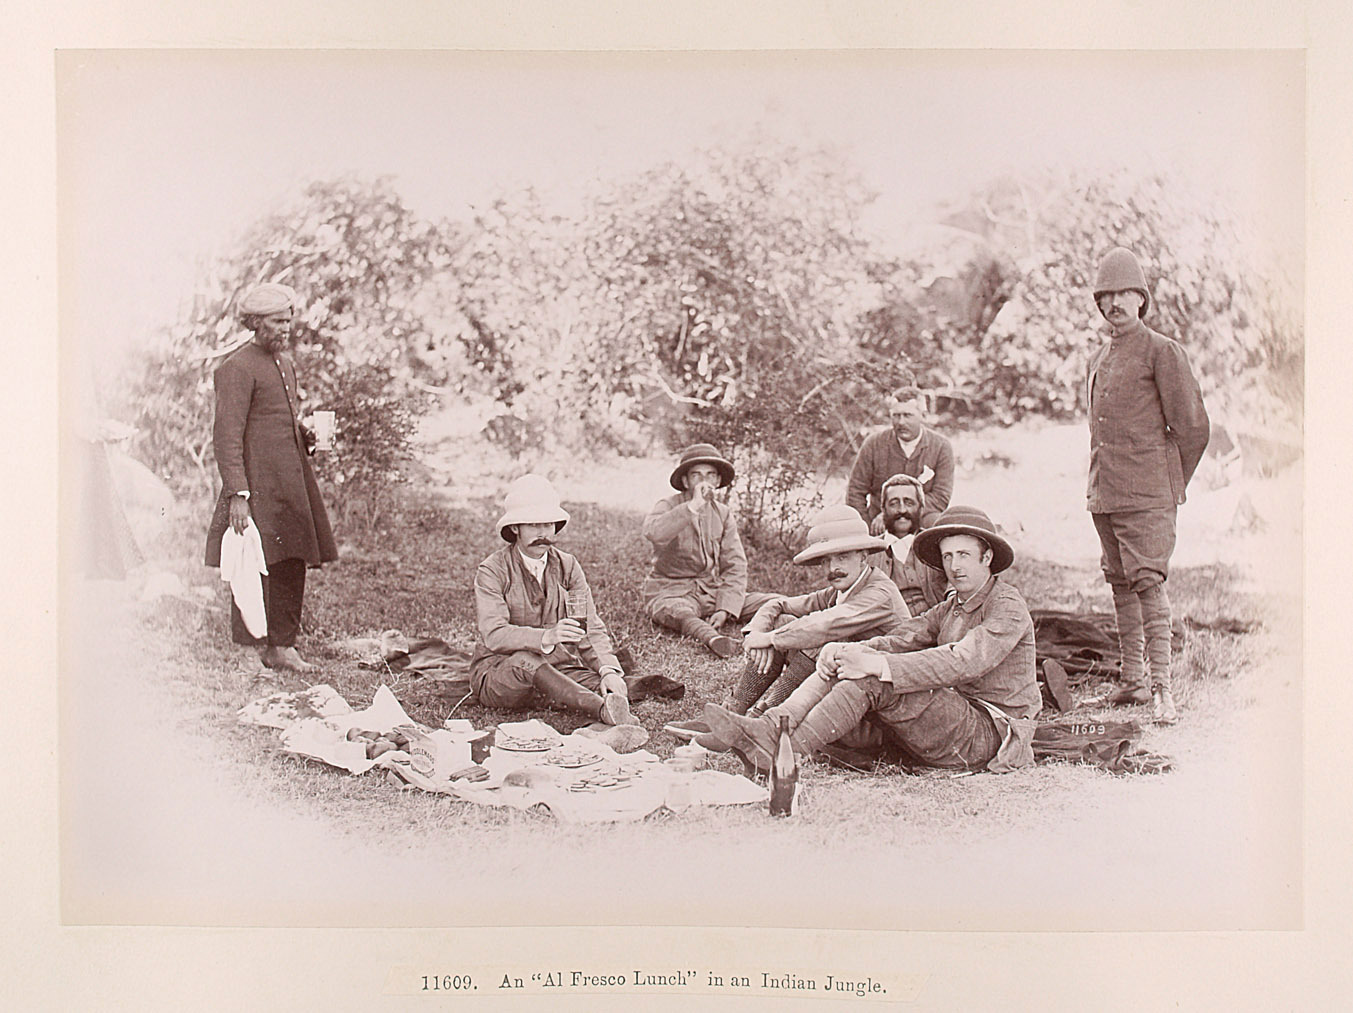 Tandur: Jagdfrühstück mit Franz Ferdinand von Lala Deen Dayal